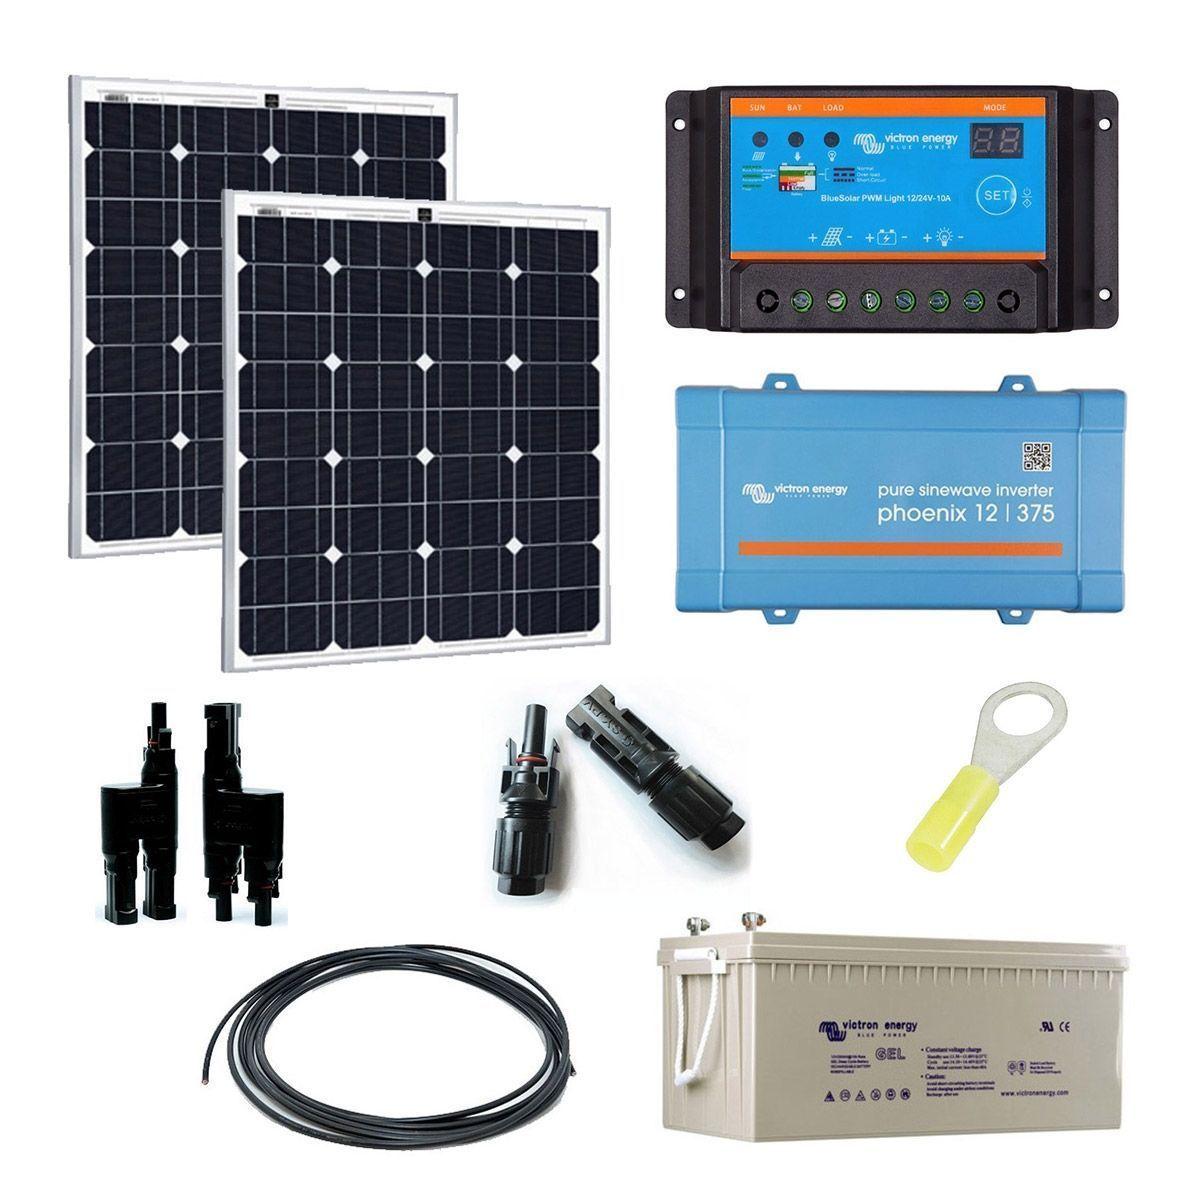 kit solaire 160w autonome 12v convertisseur 230v 375va. Black Bedroom Furniture Sets. Home Design Ideas